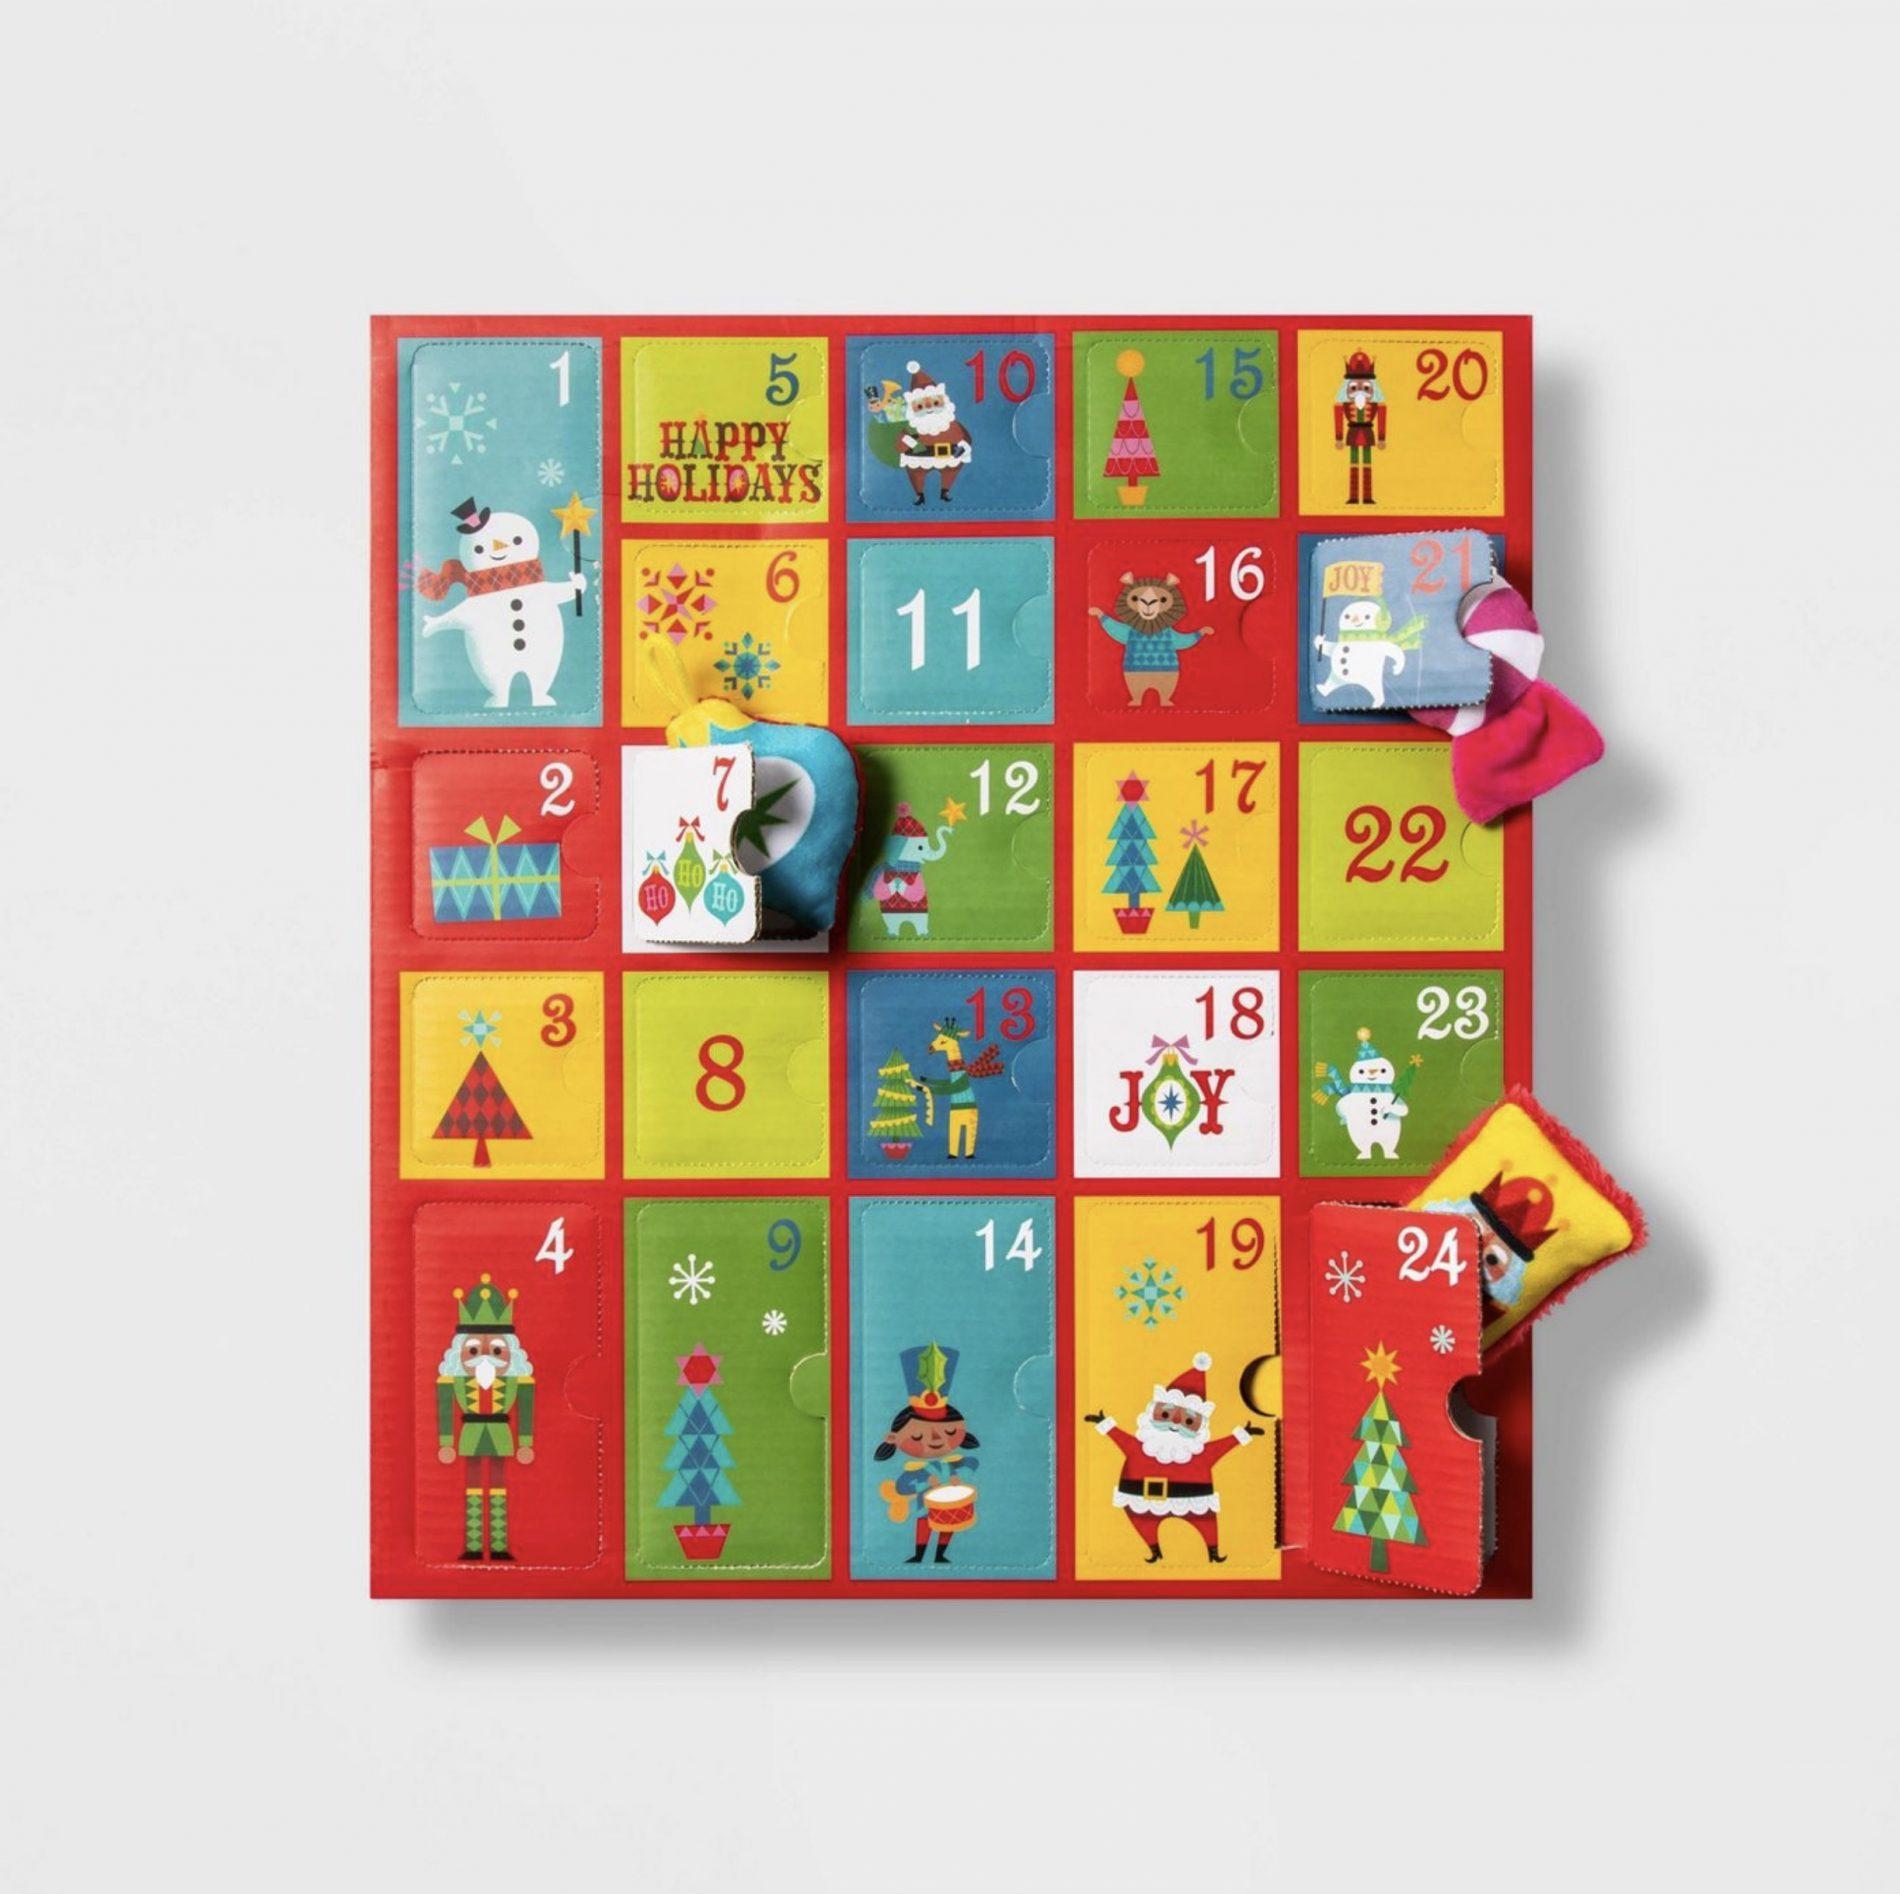 Wondershop Target Dog Toy Advent Calendar – 24pk